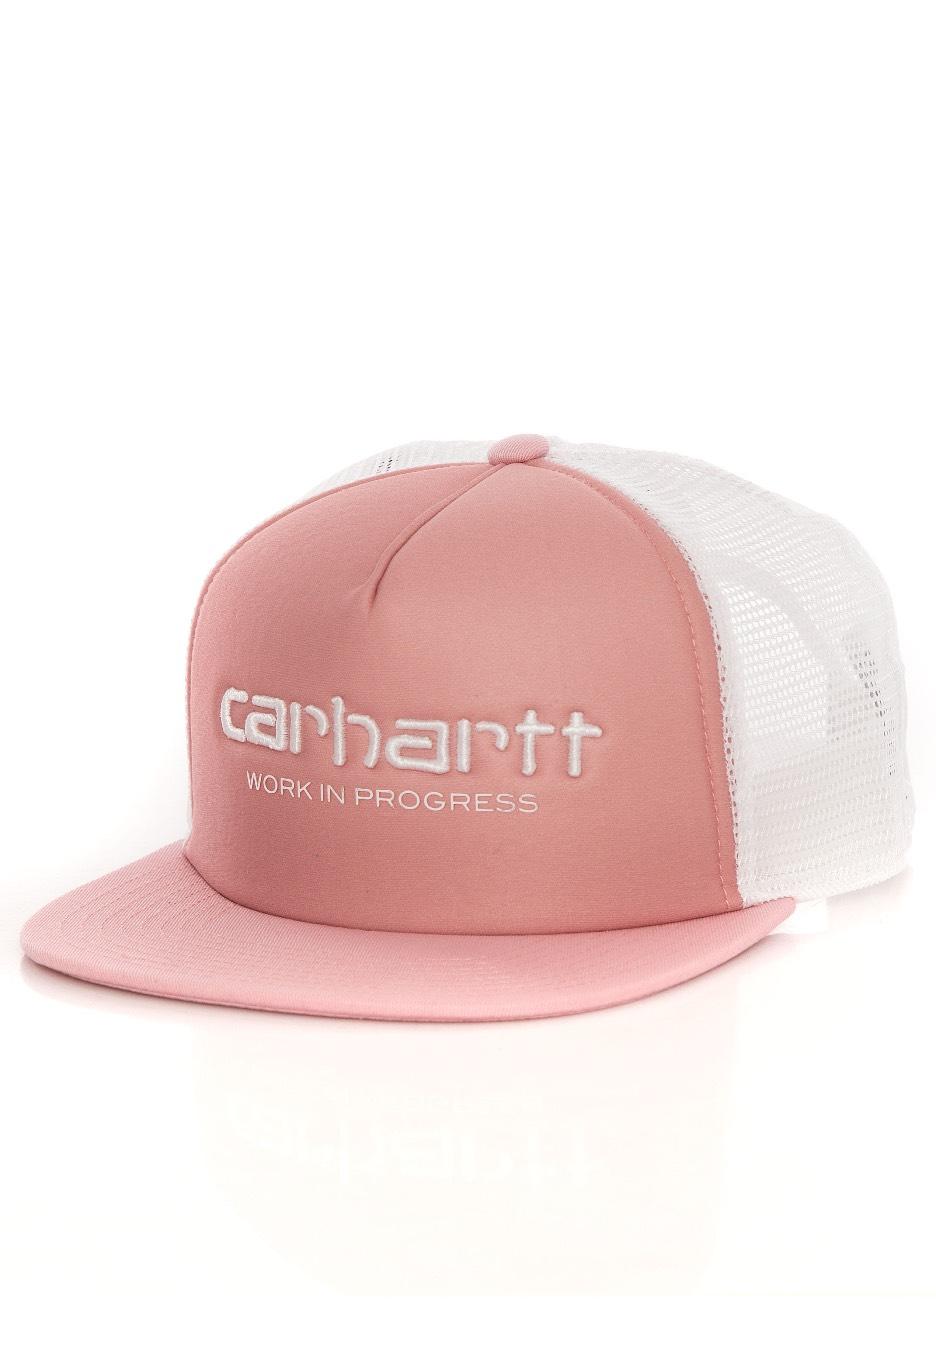 Carhartt WIP - Carhartt WIP Trucker Soft Rose/W...